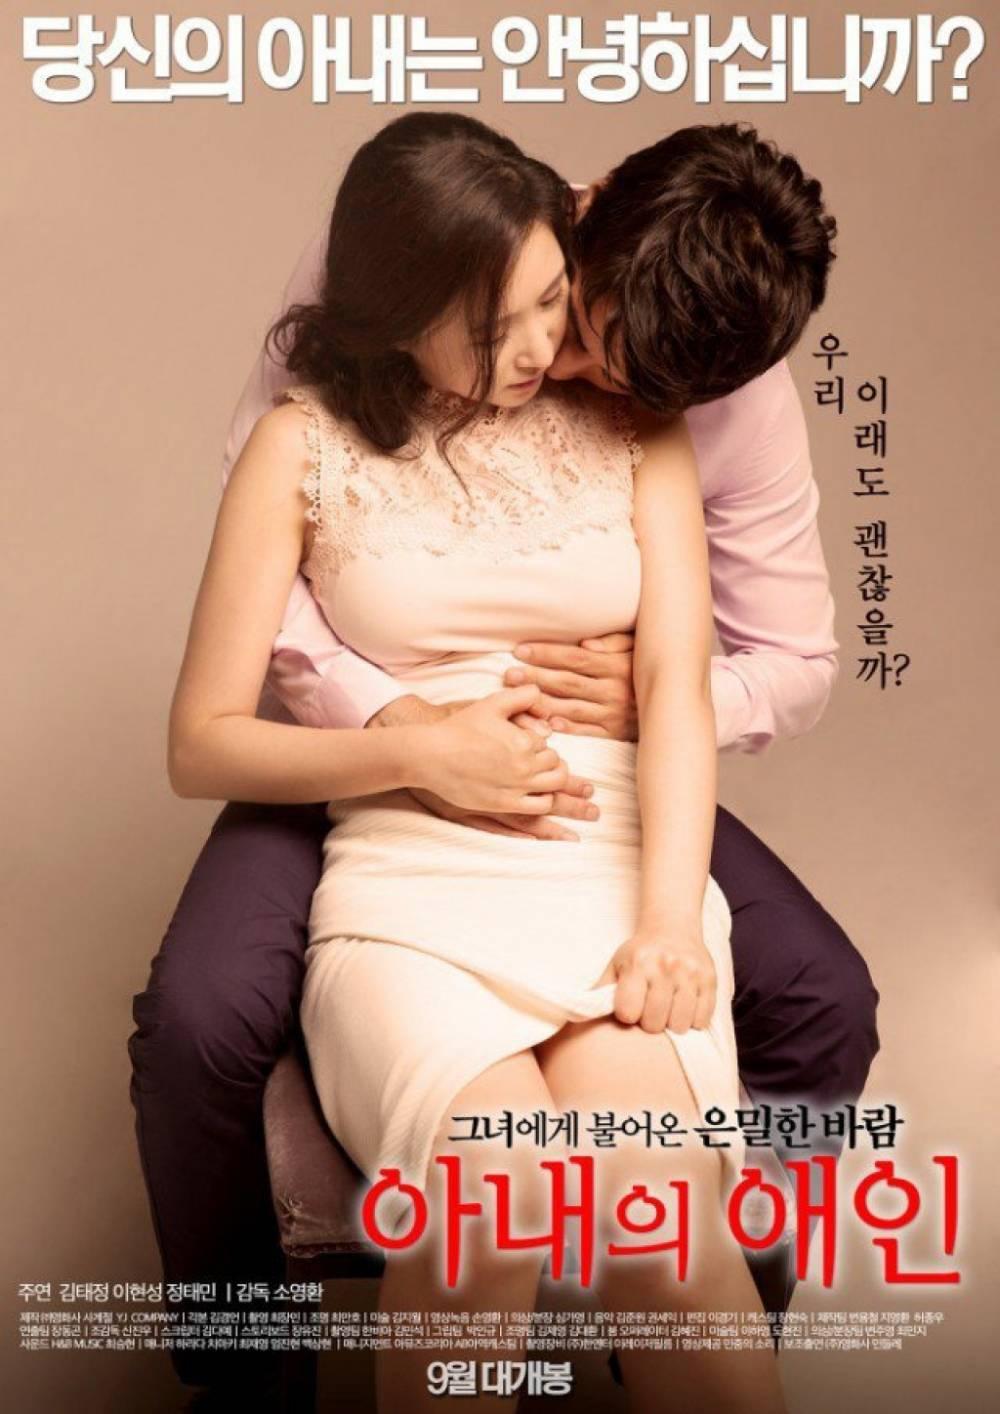 18 Hot Sex Movie s7movie   18-movie